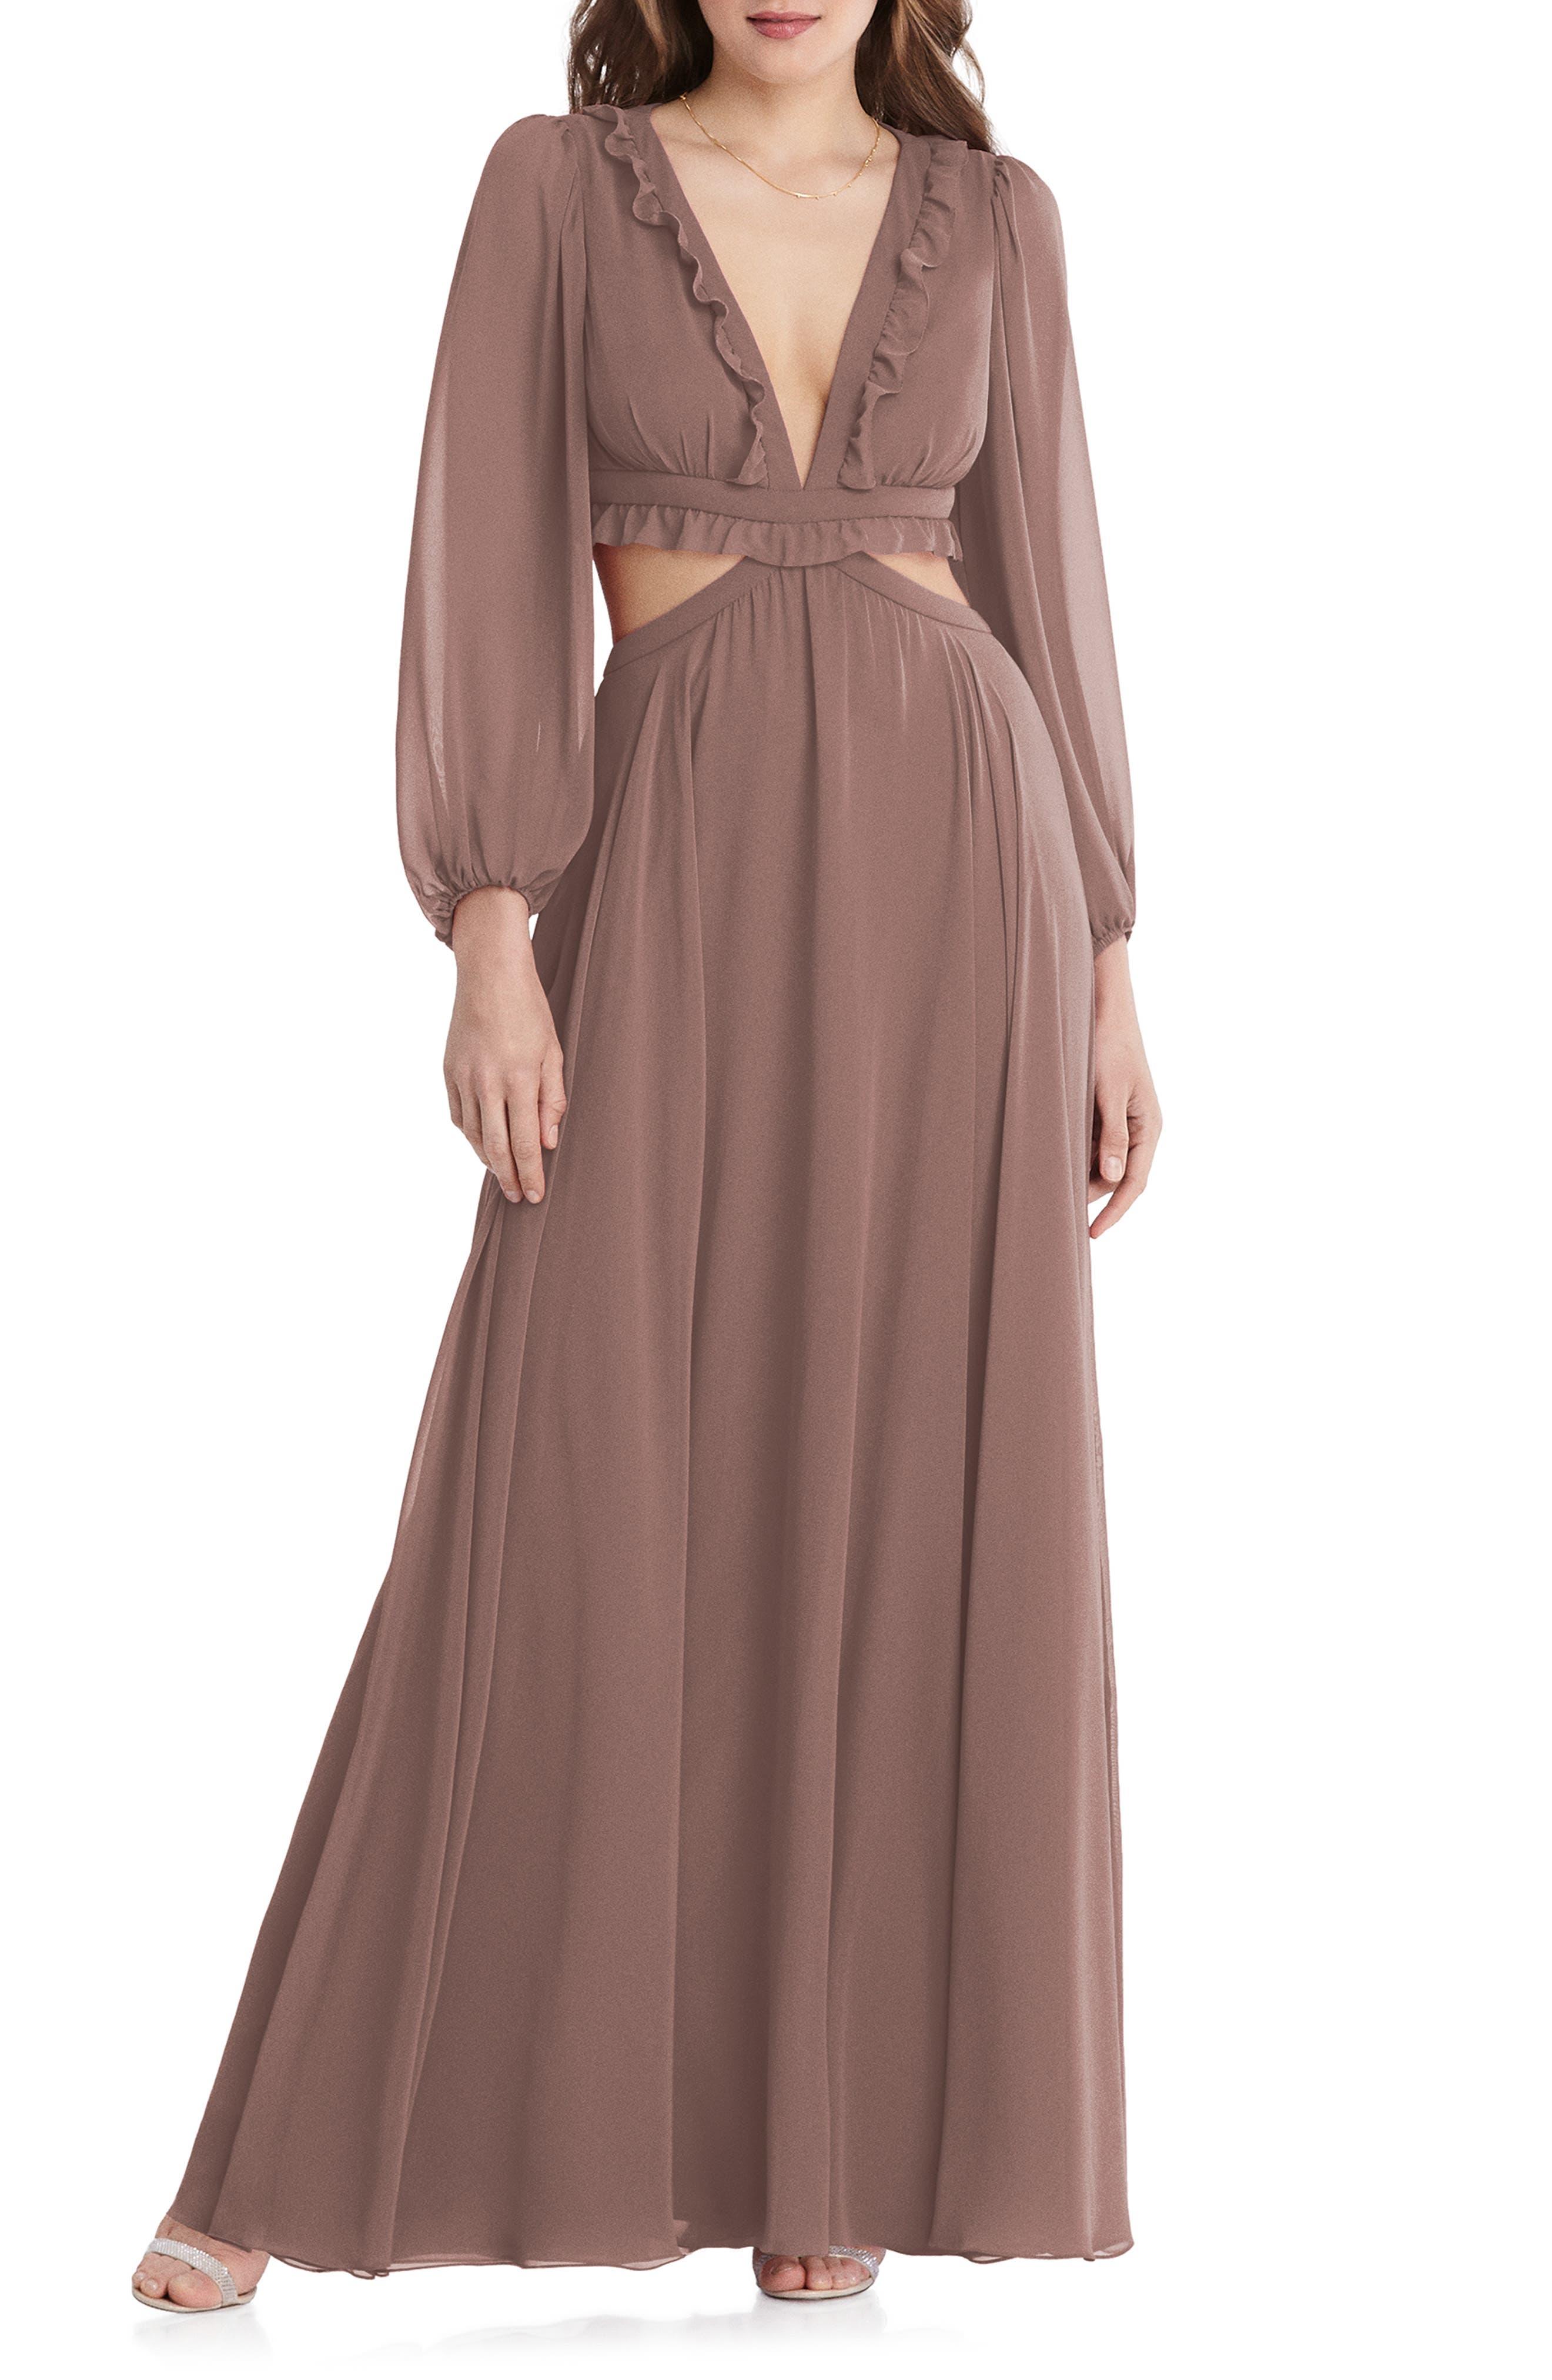 Harlow Cutout Detail Long Sleeve Chiffon Gown